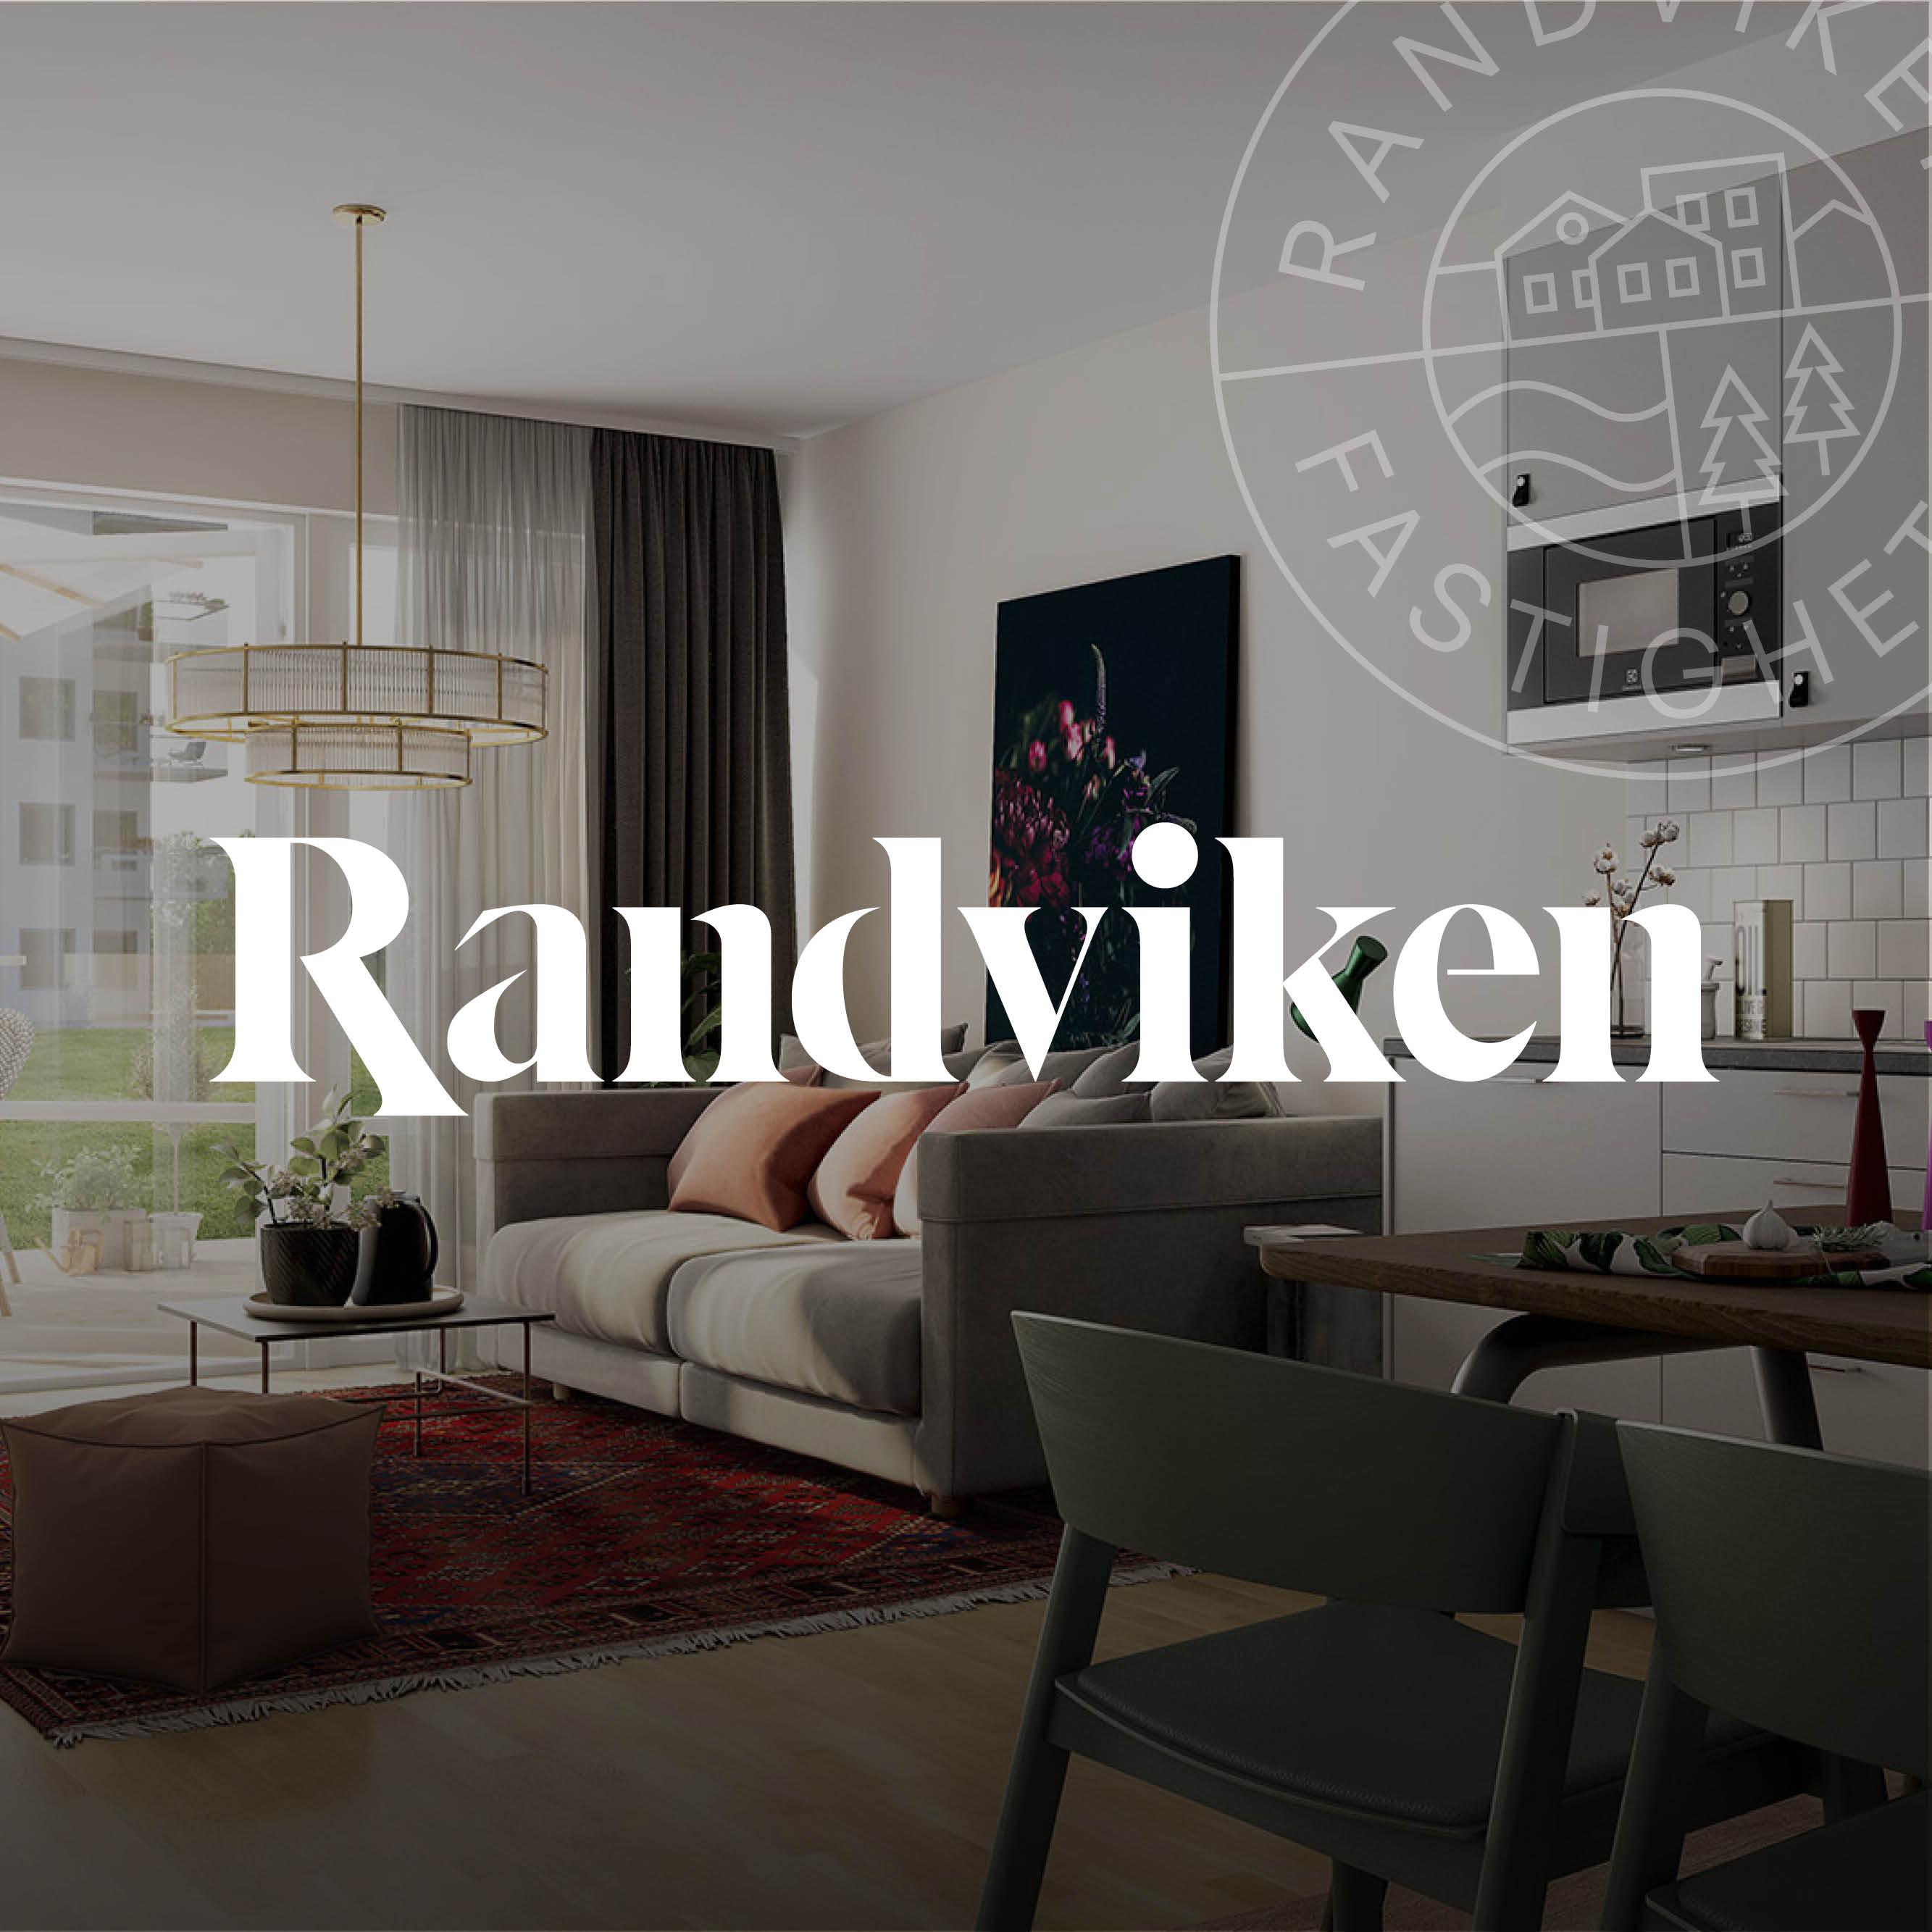 Randviken_ZelloutWebb2